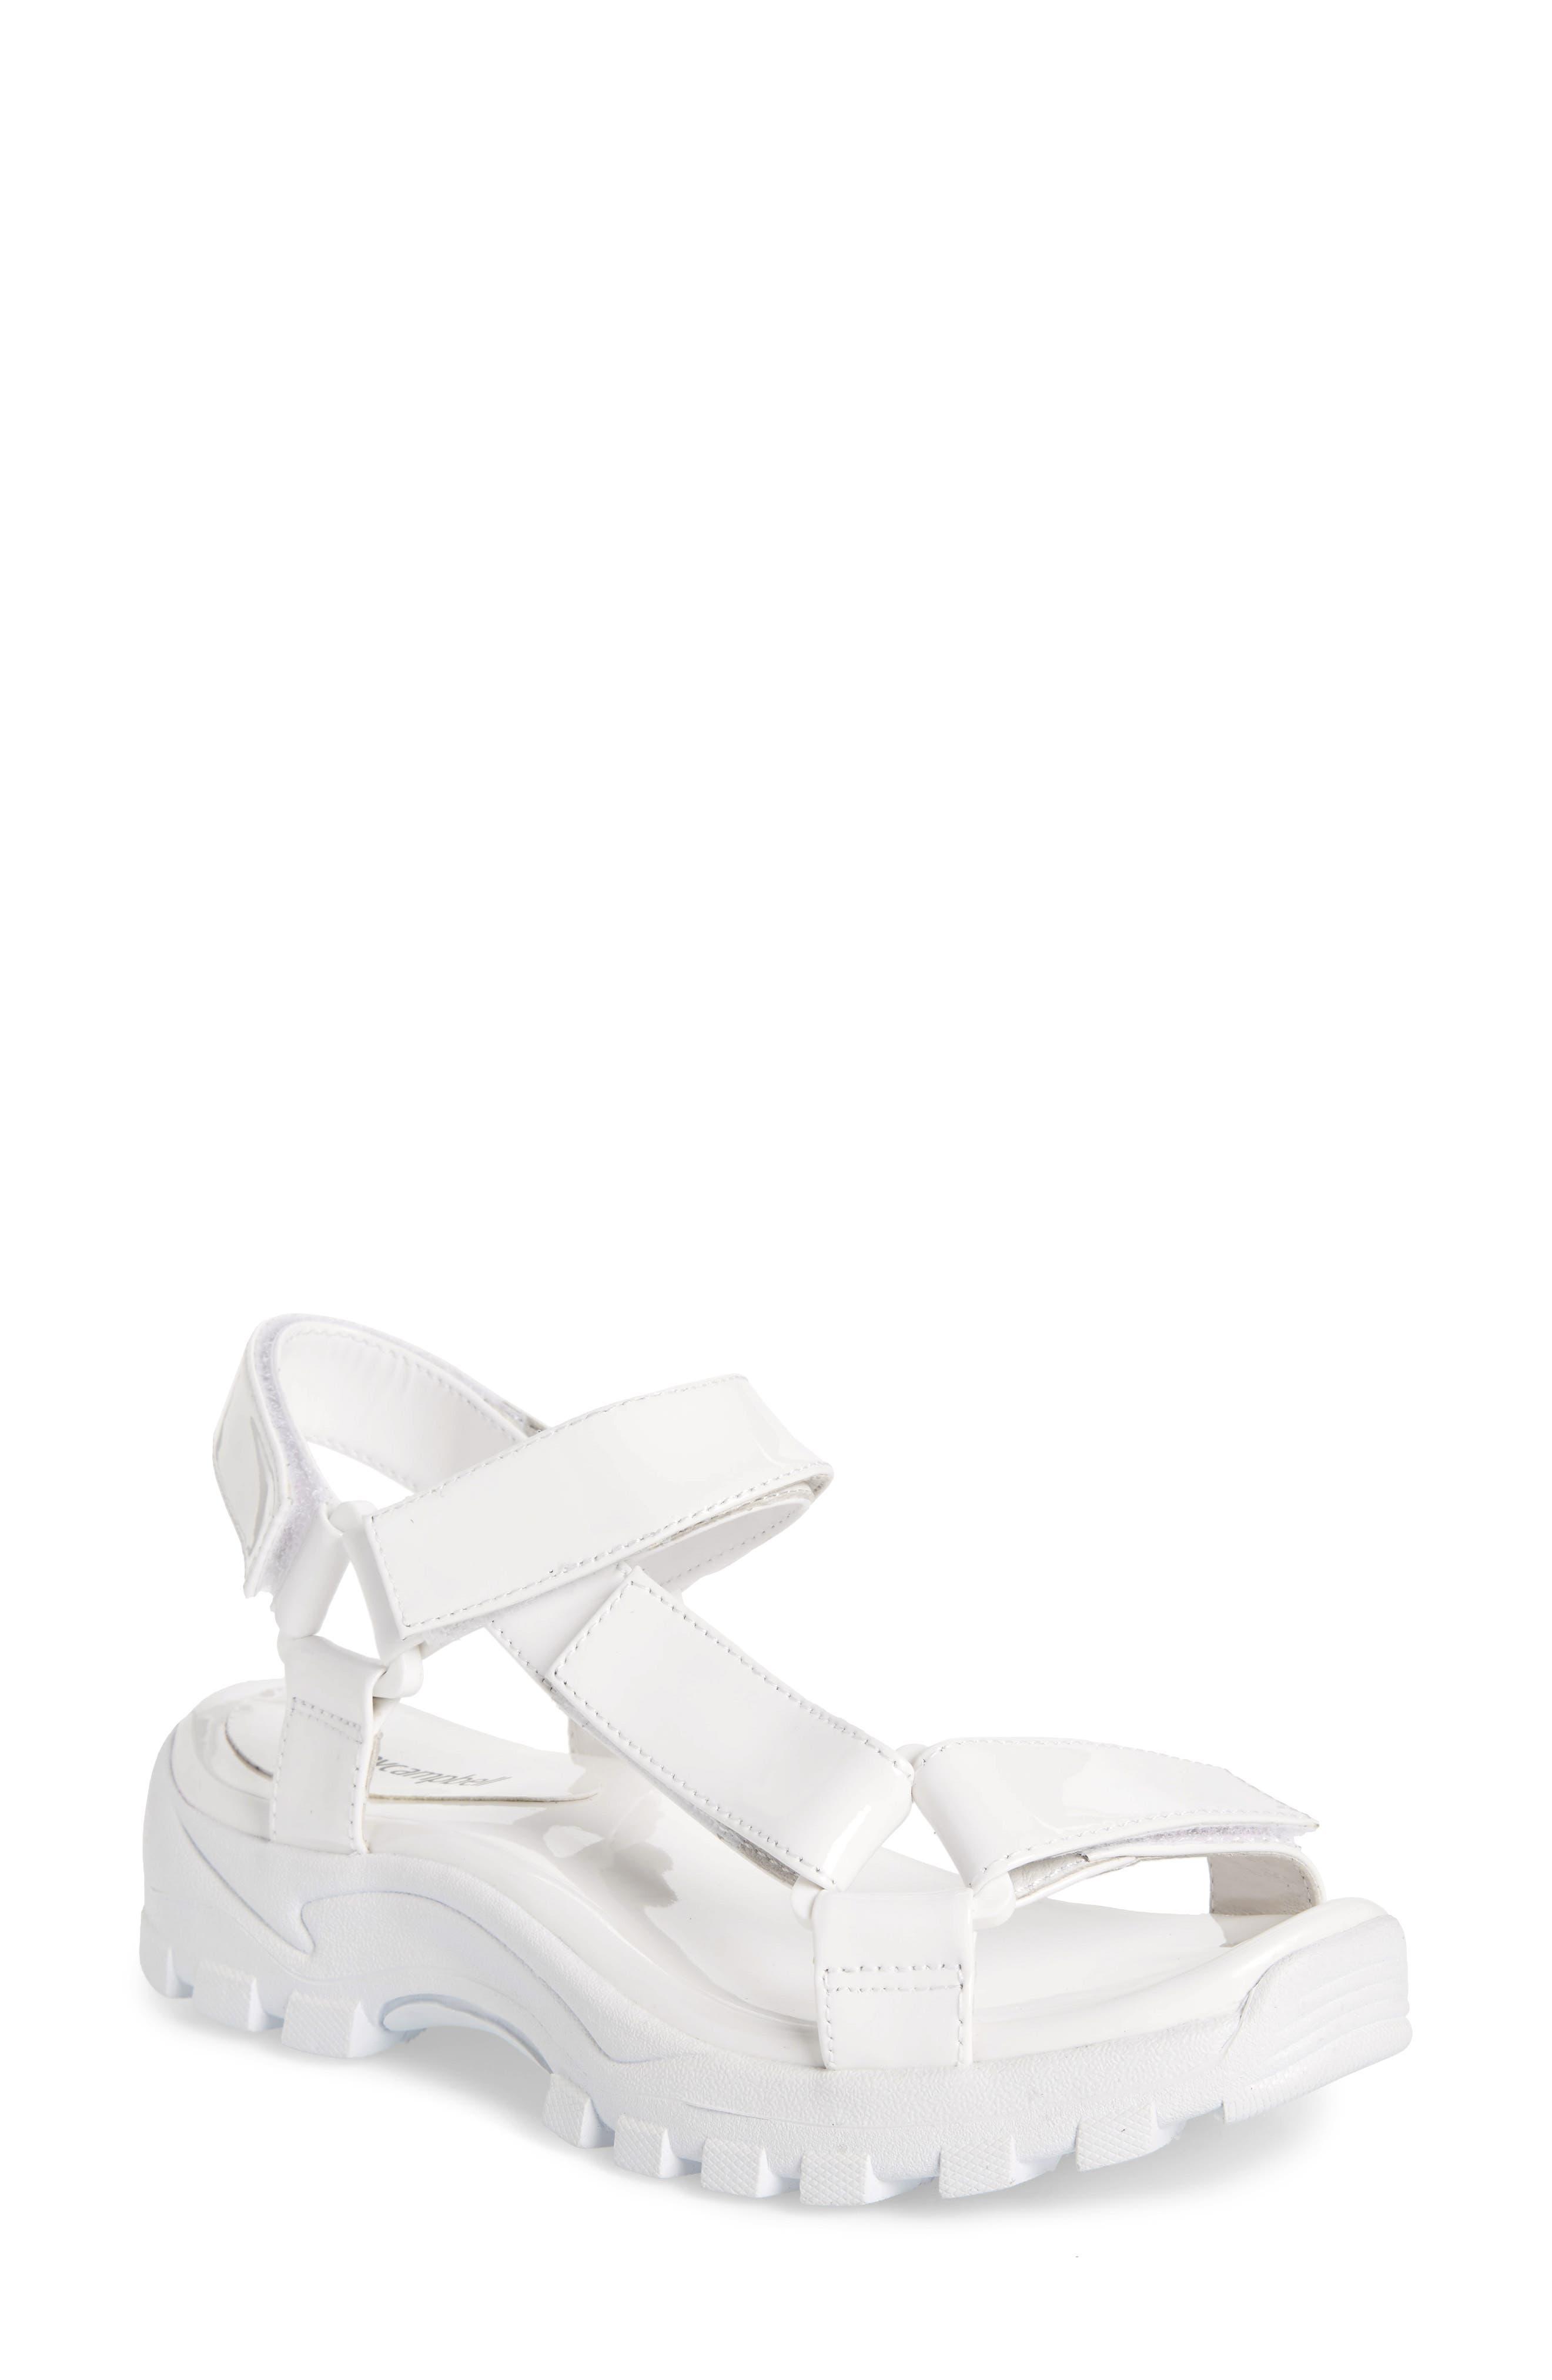 ,                             Patio Sport Sandal,                             Main thumbnail 1, color,                             WHITE PATENT LEATHER/ WHITE